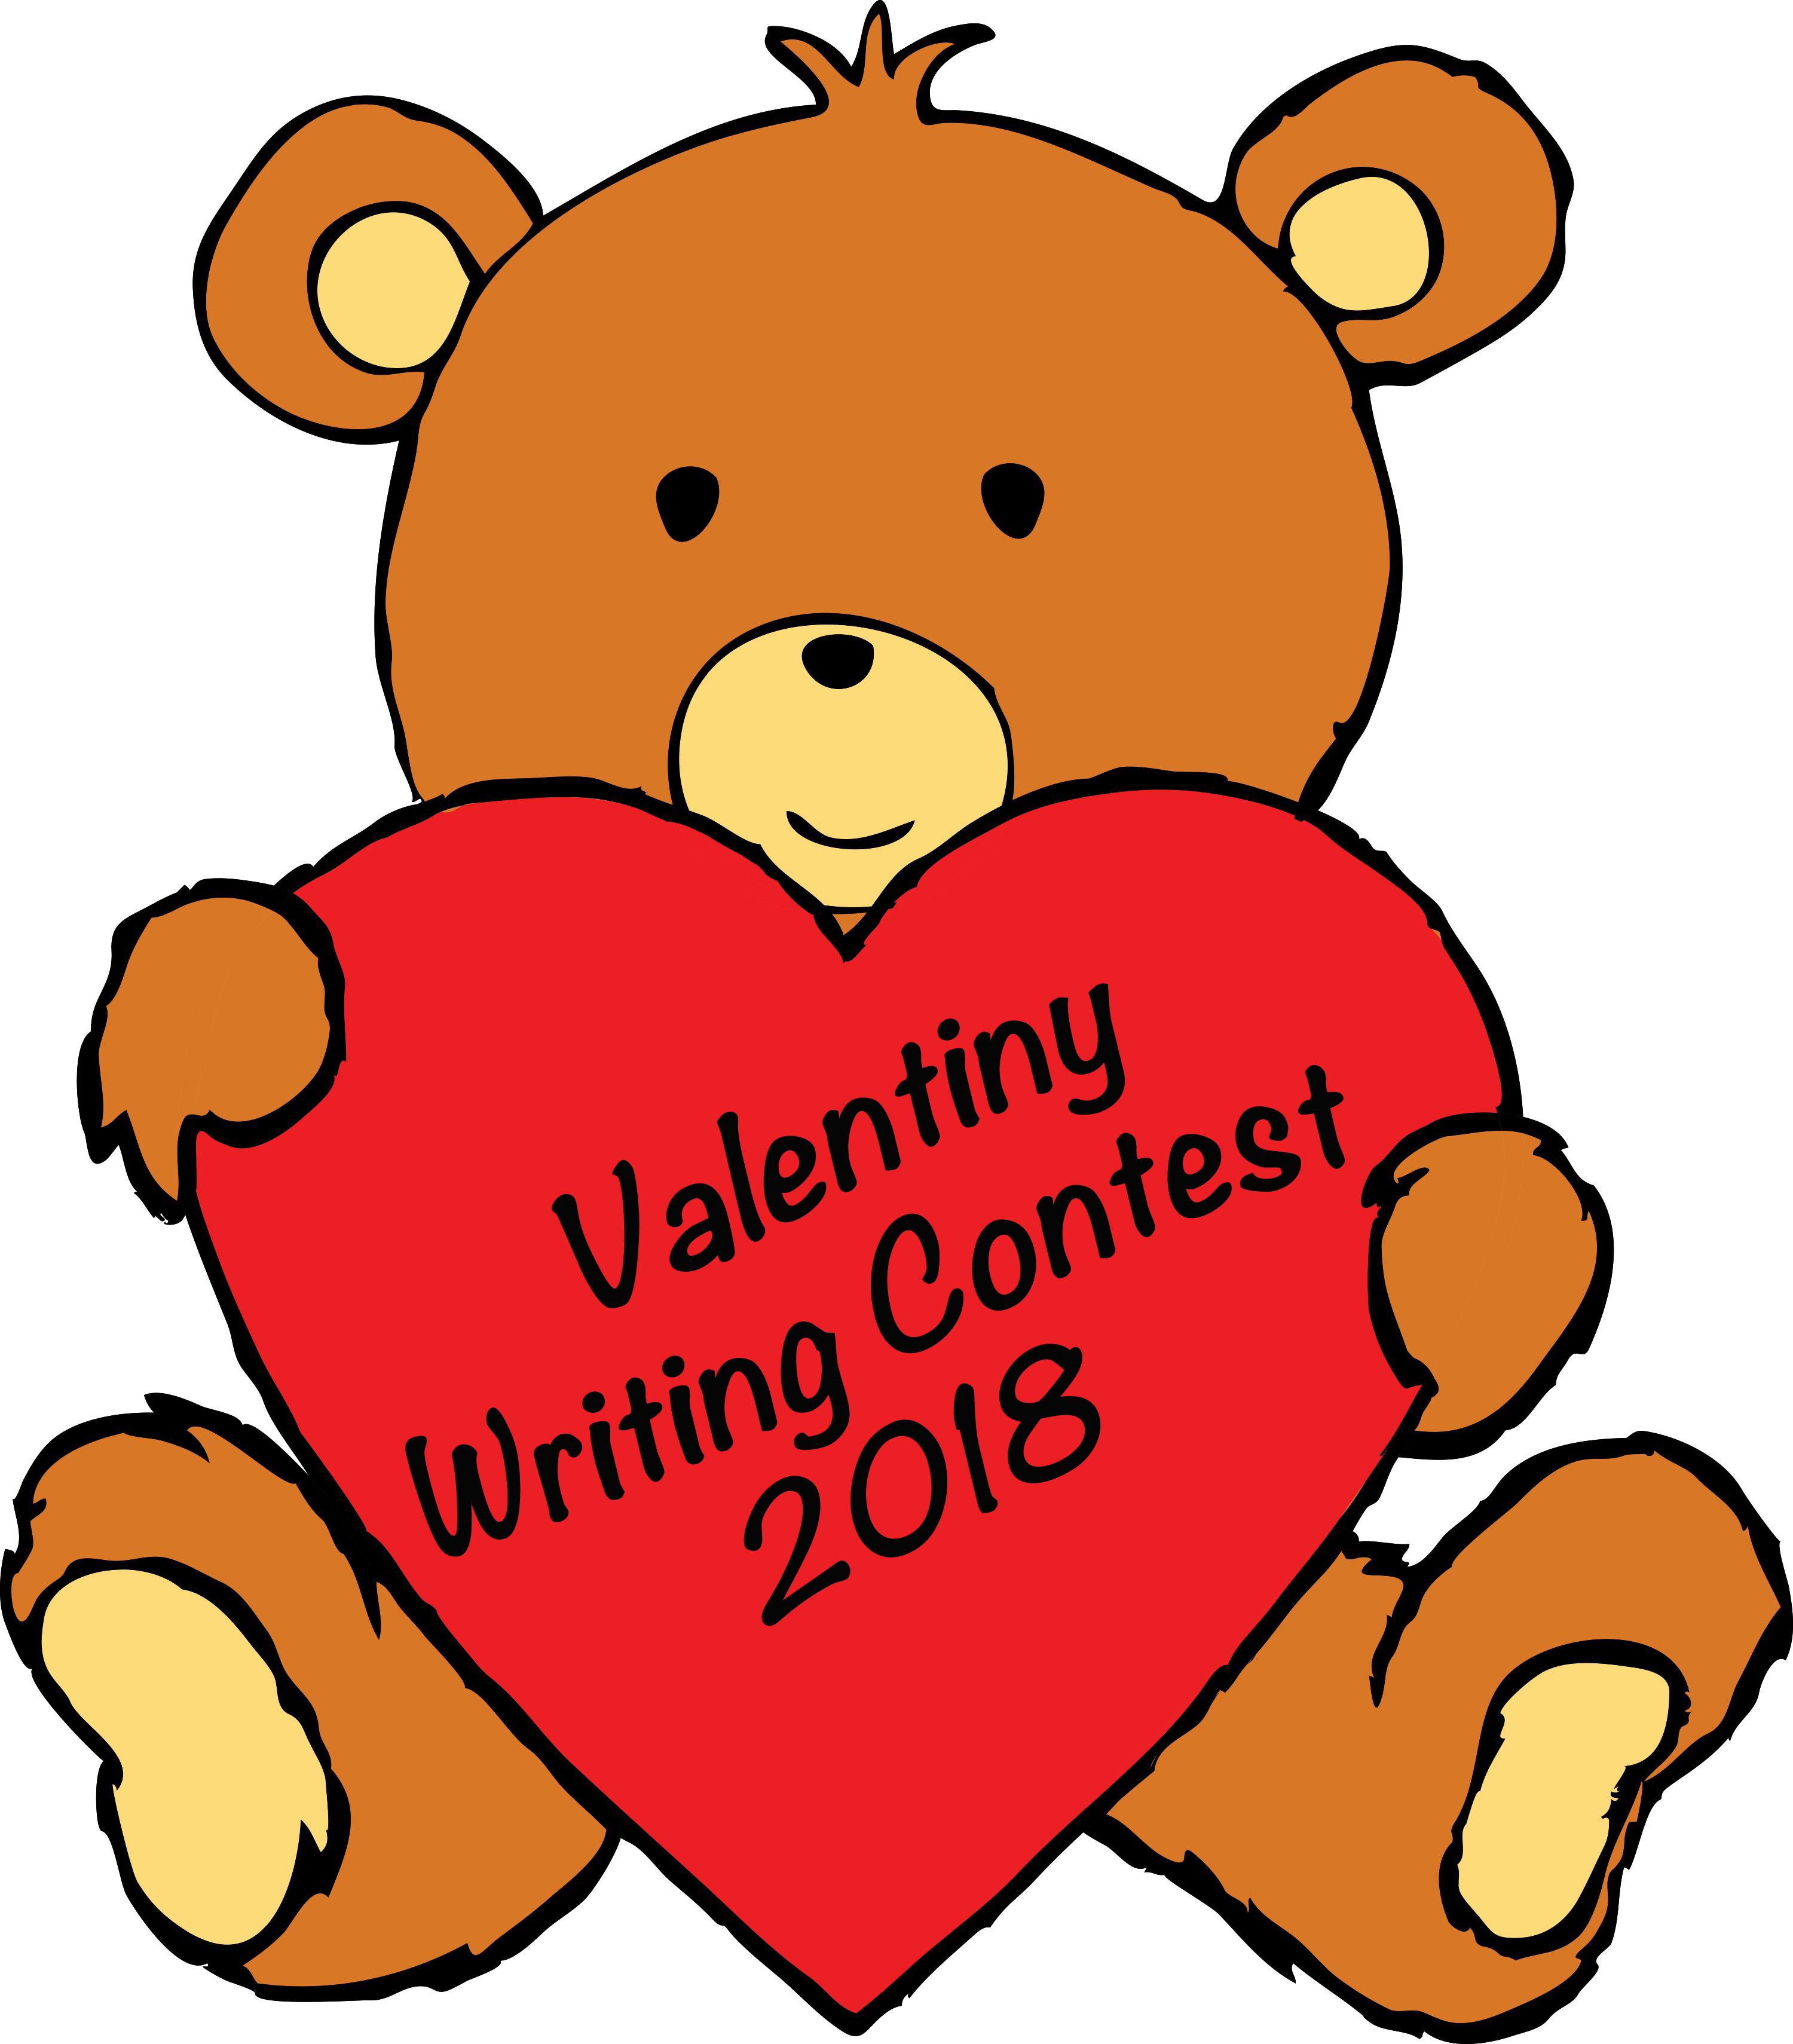 Valentiny Writing Contest 2018